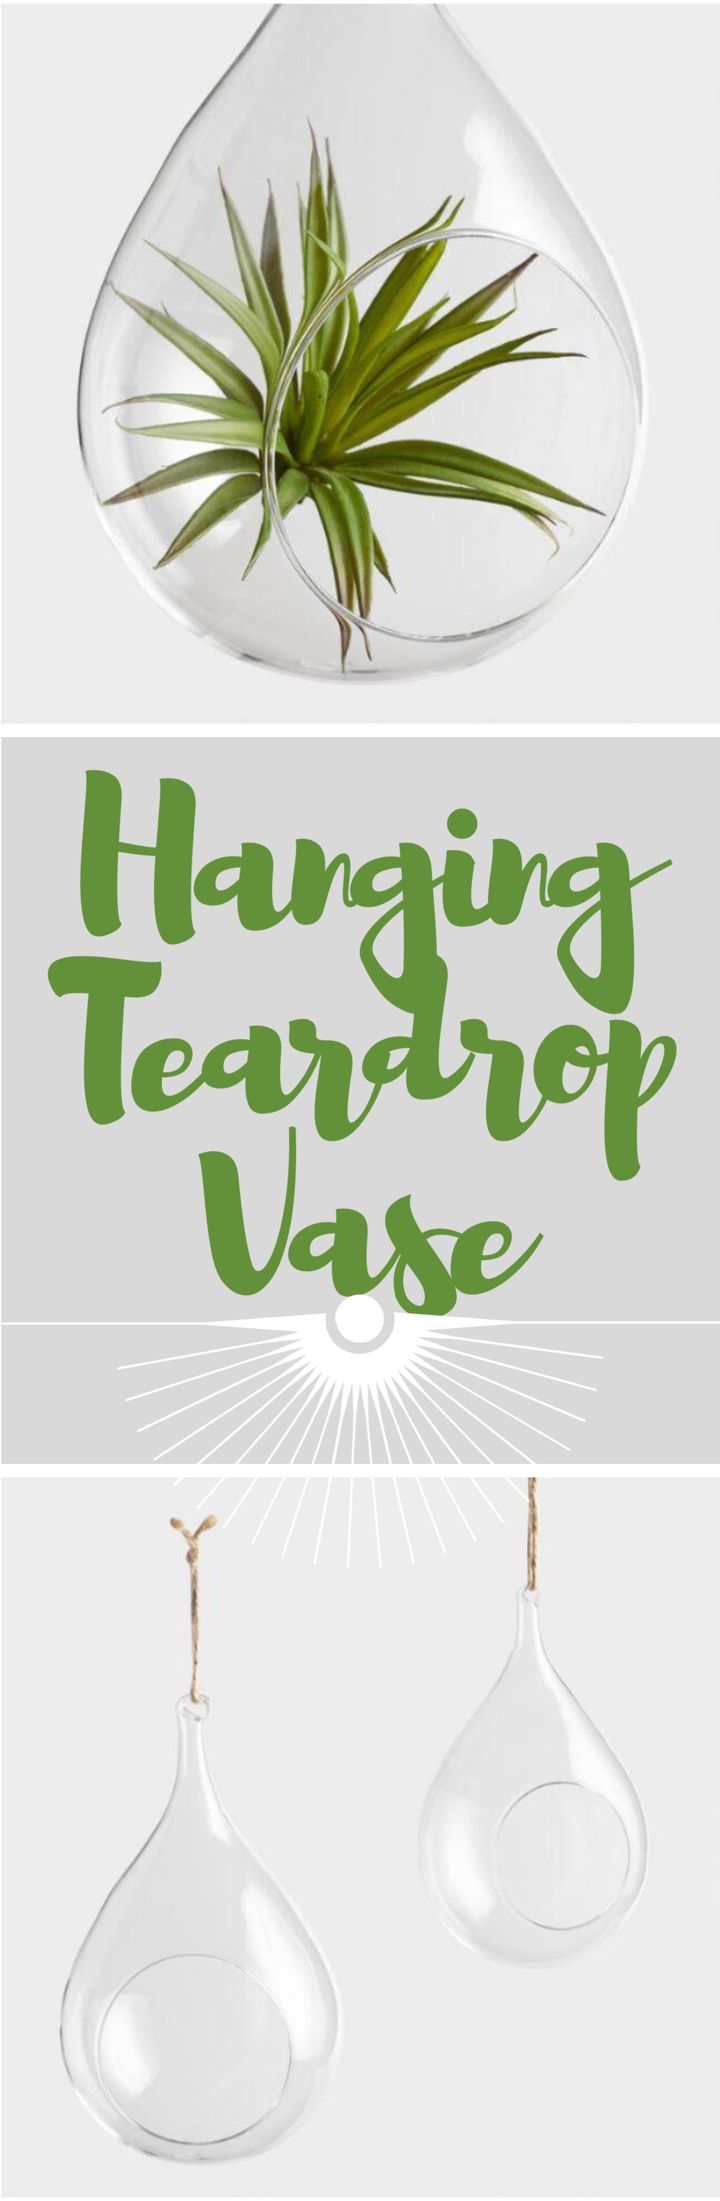 Cost Plus World Market Hanging Teardrop Vase  #ad #vase #indoorplants #plants #terrarium #home #homedecor #decor